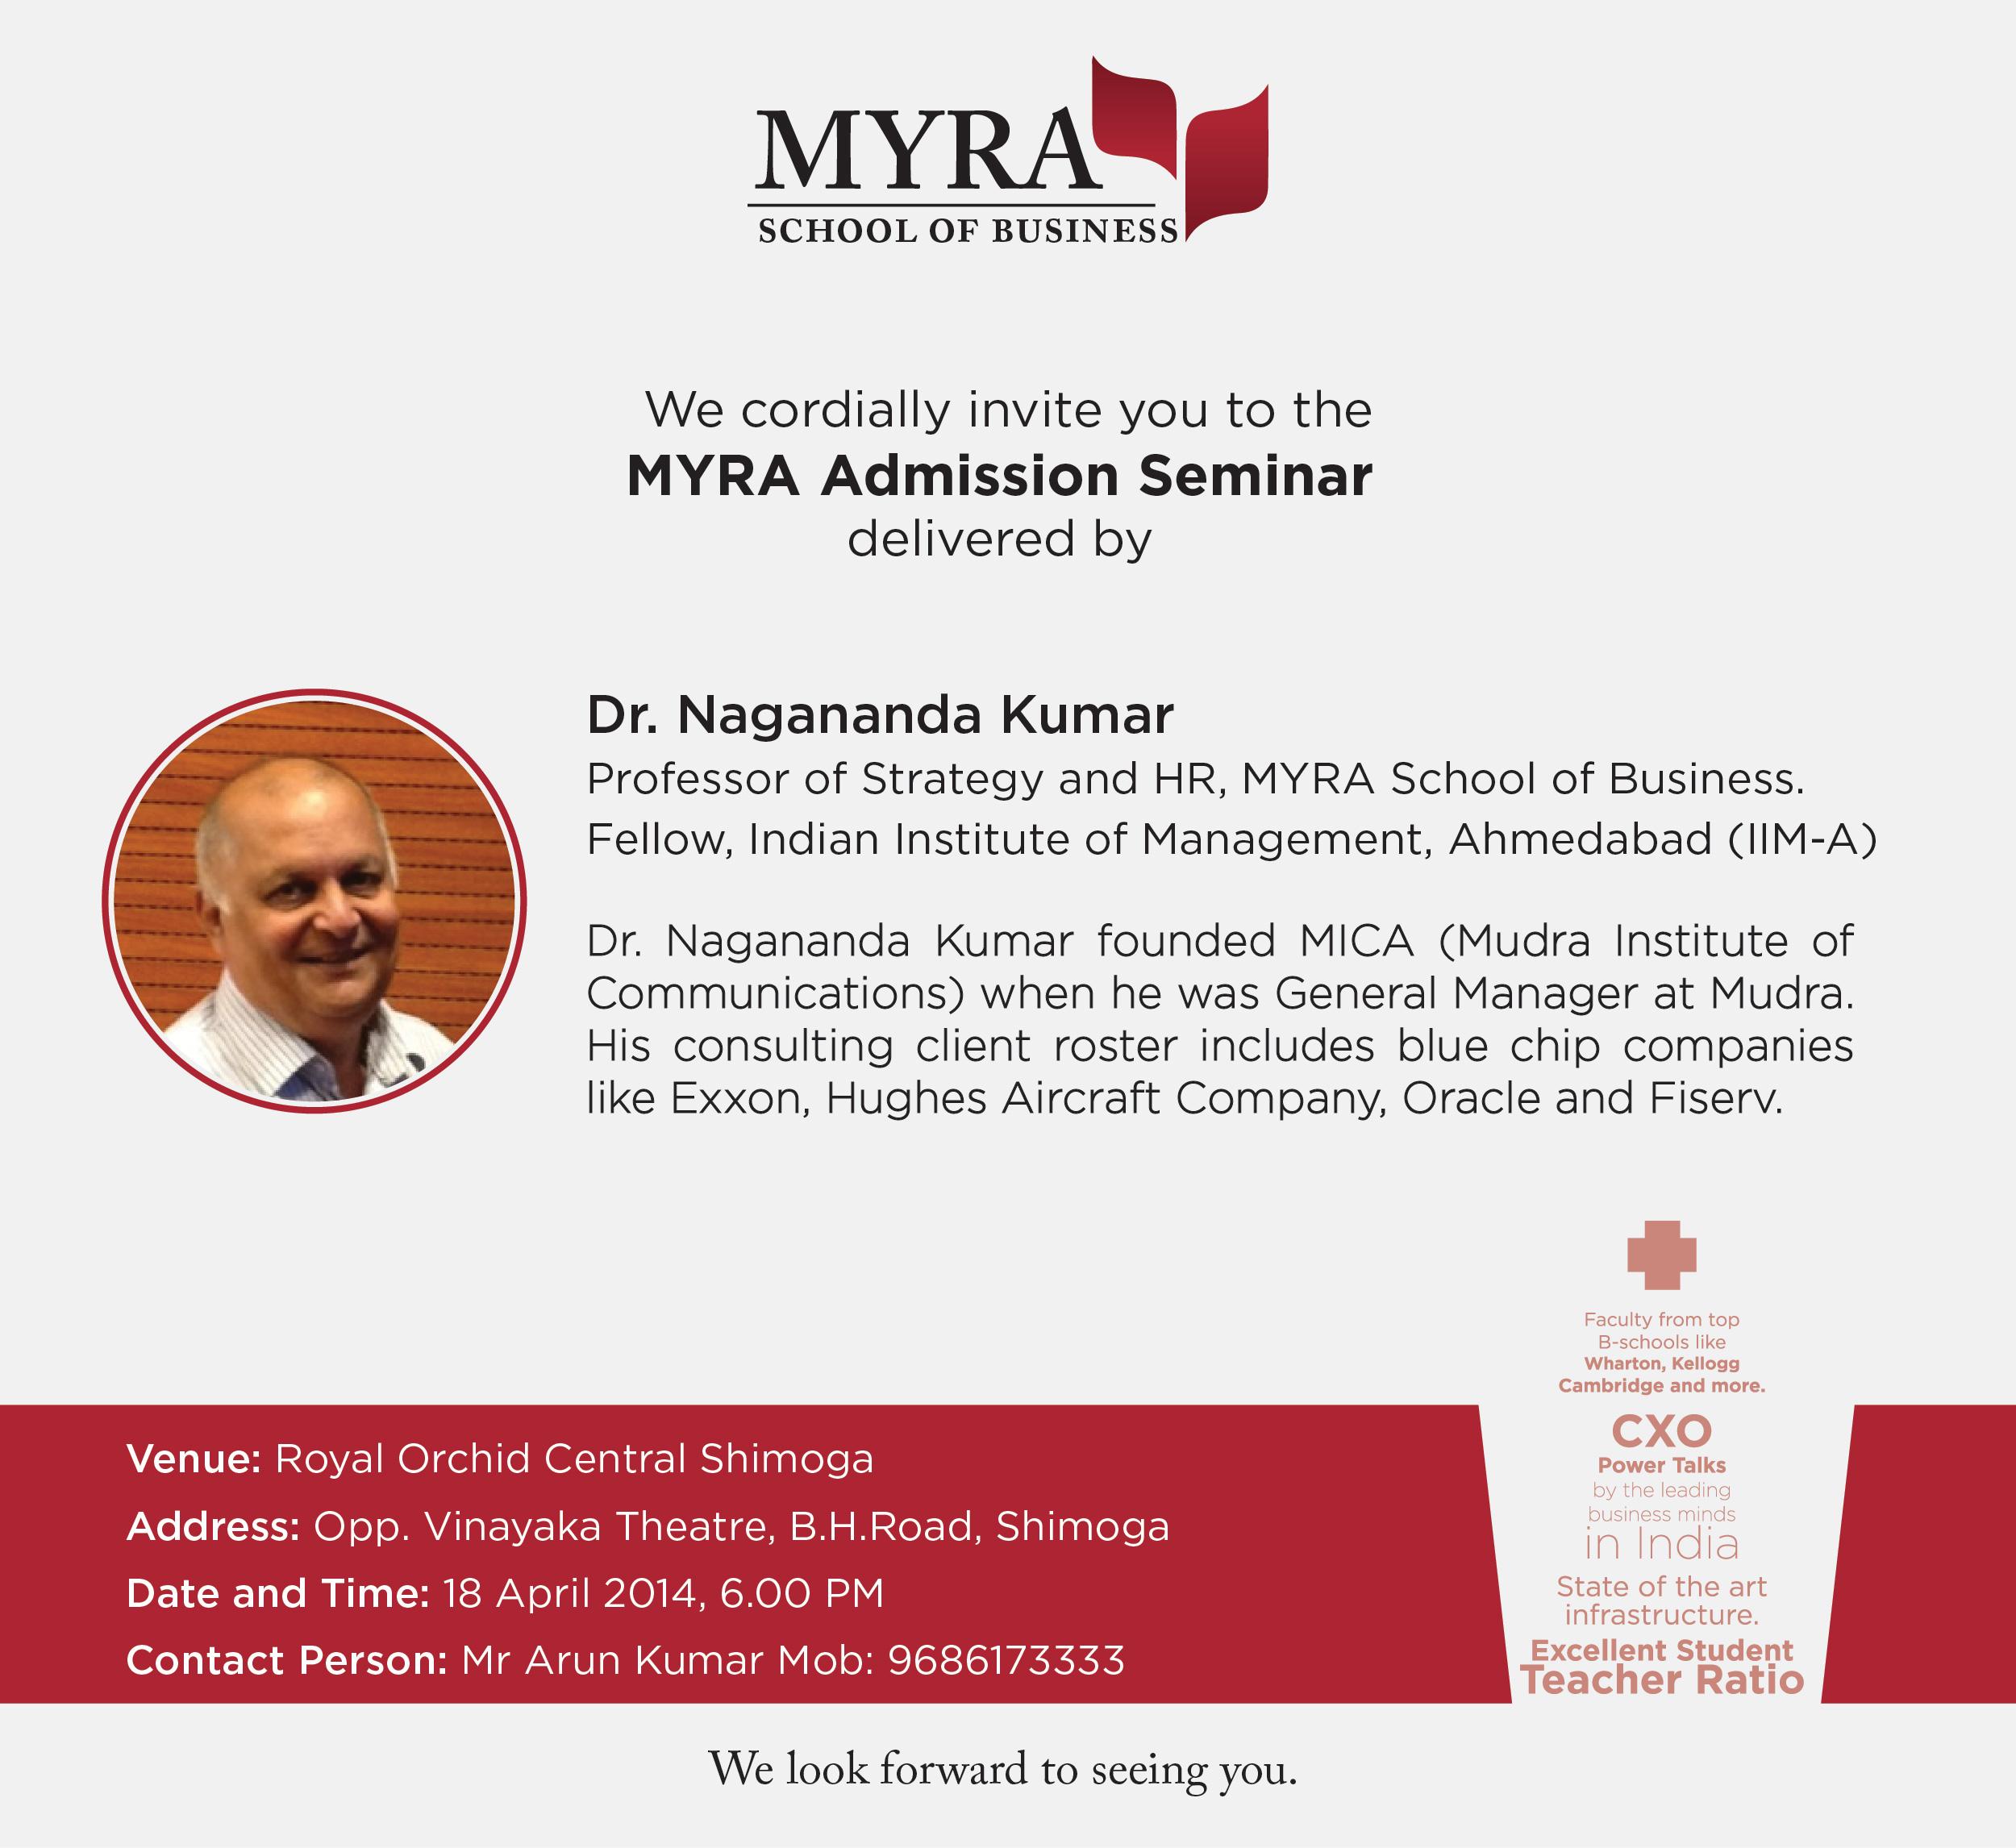 MYRA-AdmissionSeminar-Shimoga_invite